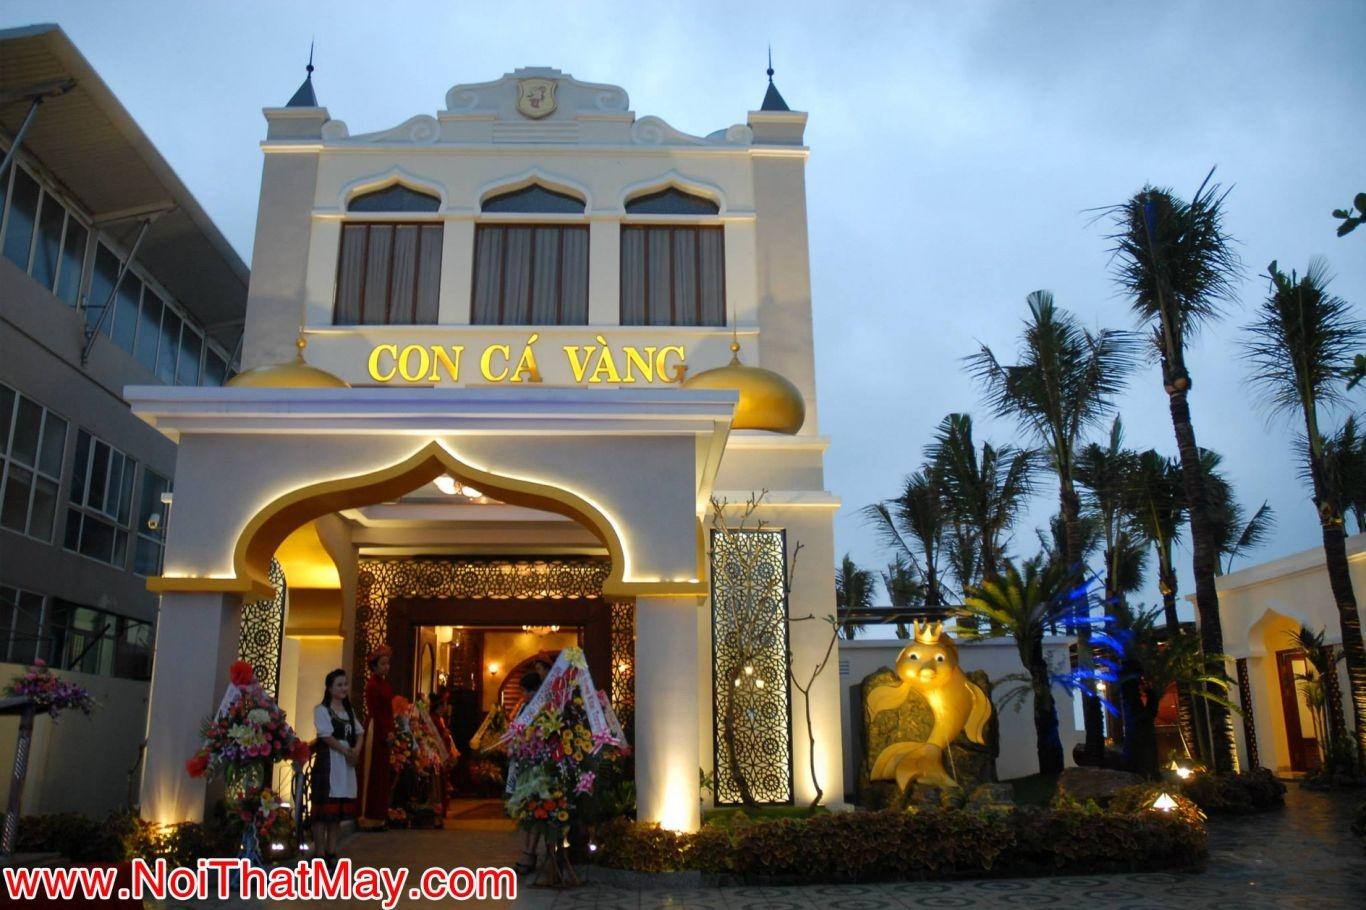 Restaurant Con Ca Vang